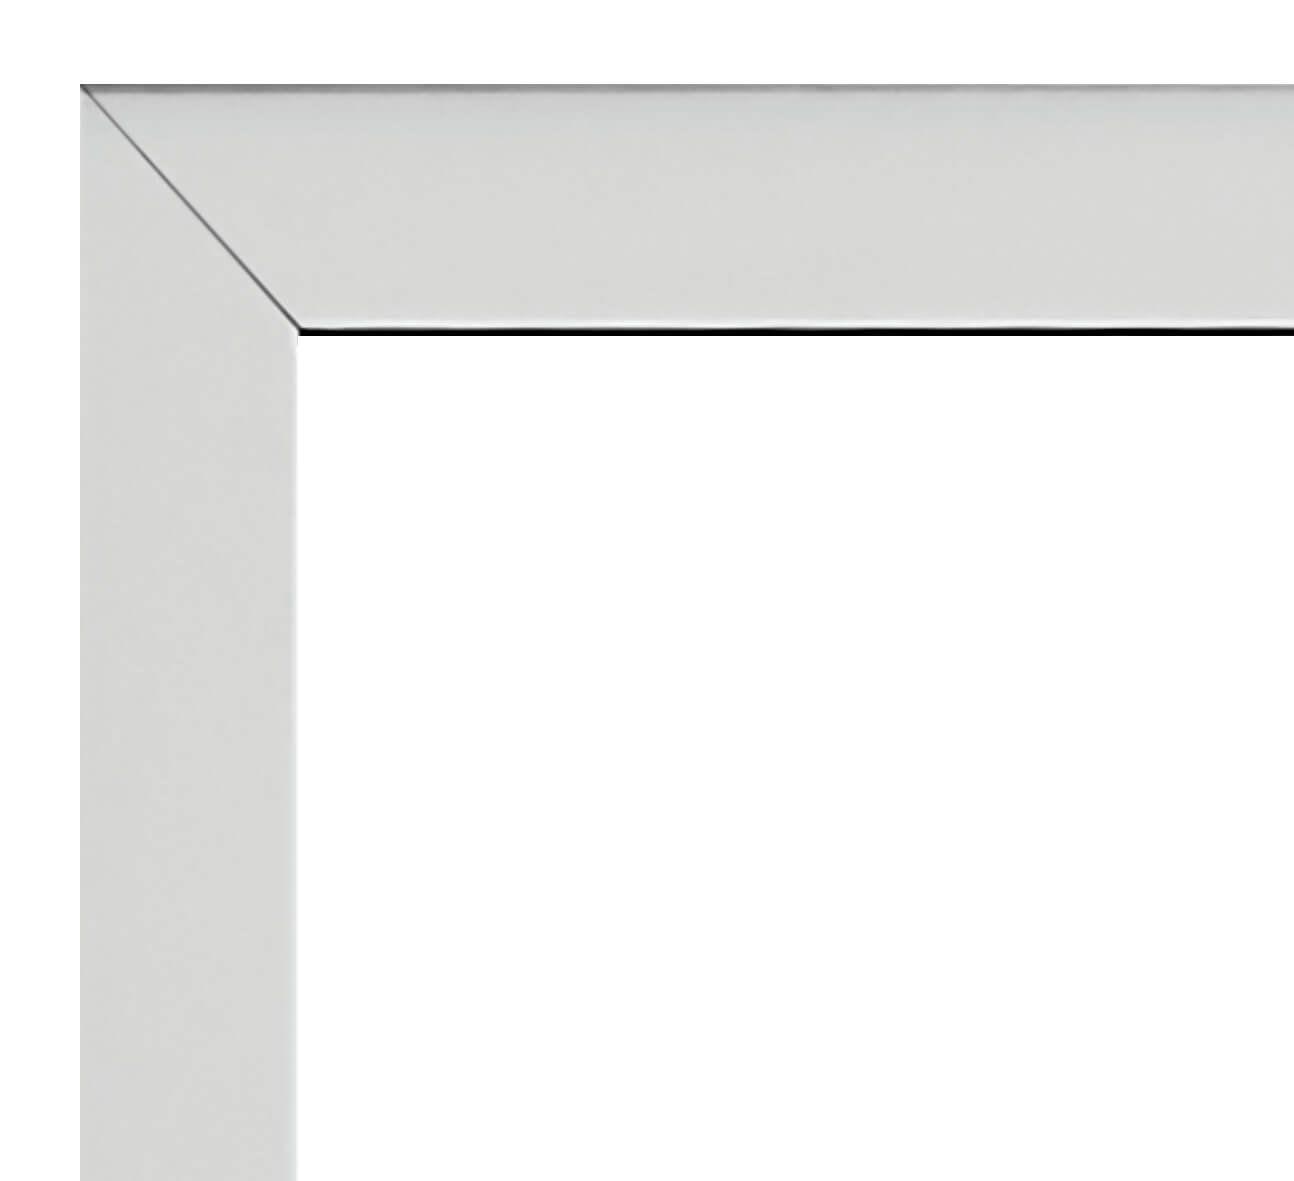 Aluminium Guarnição - 1.20x2.00 Ref. 74.92.628-2 Sasazaki